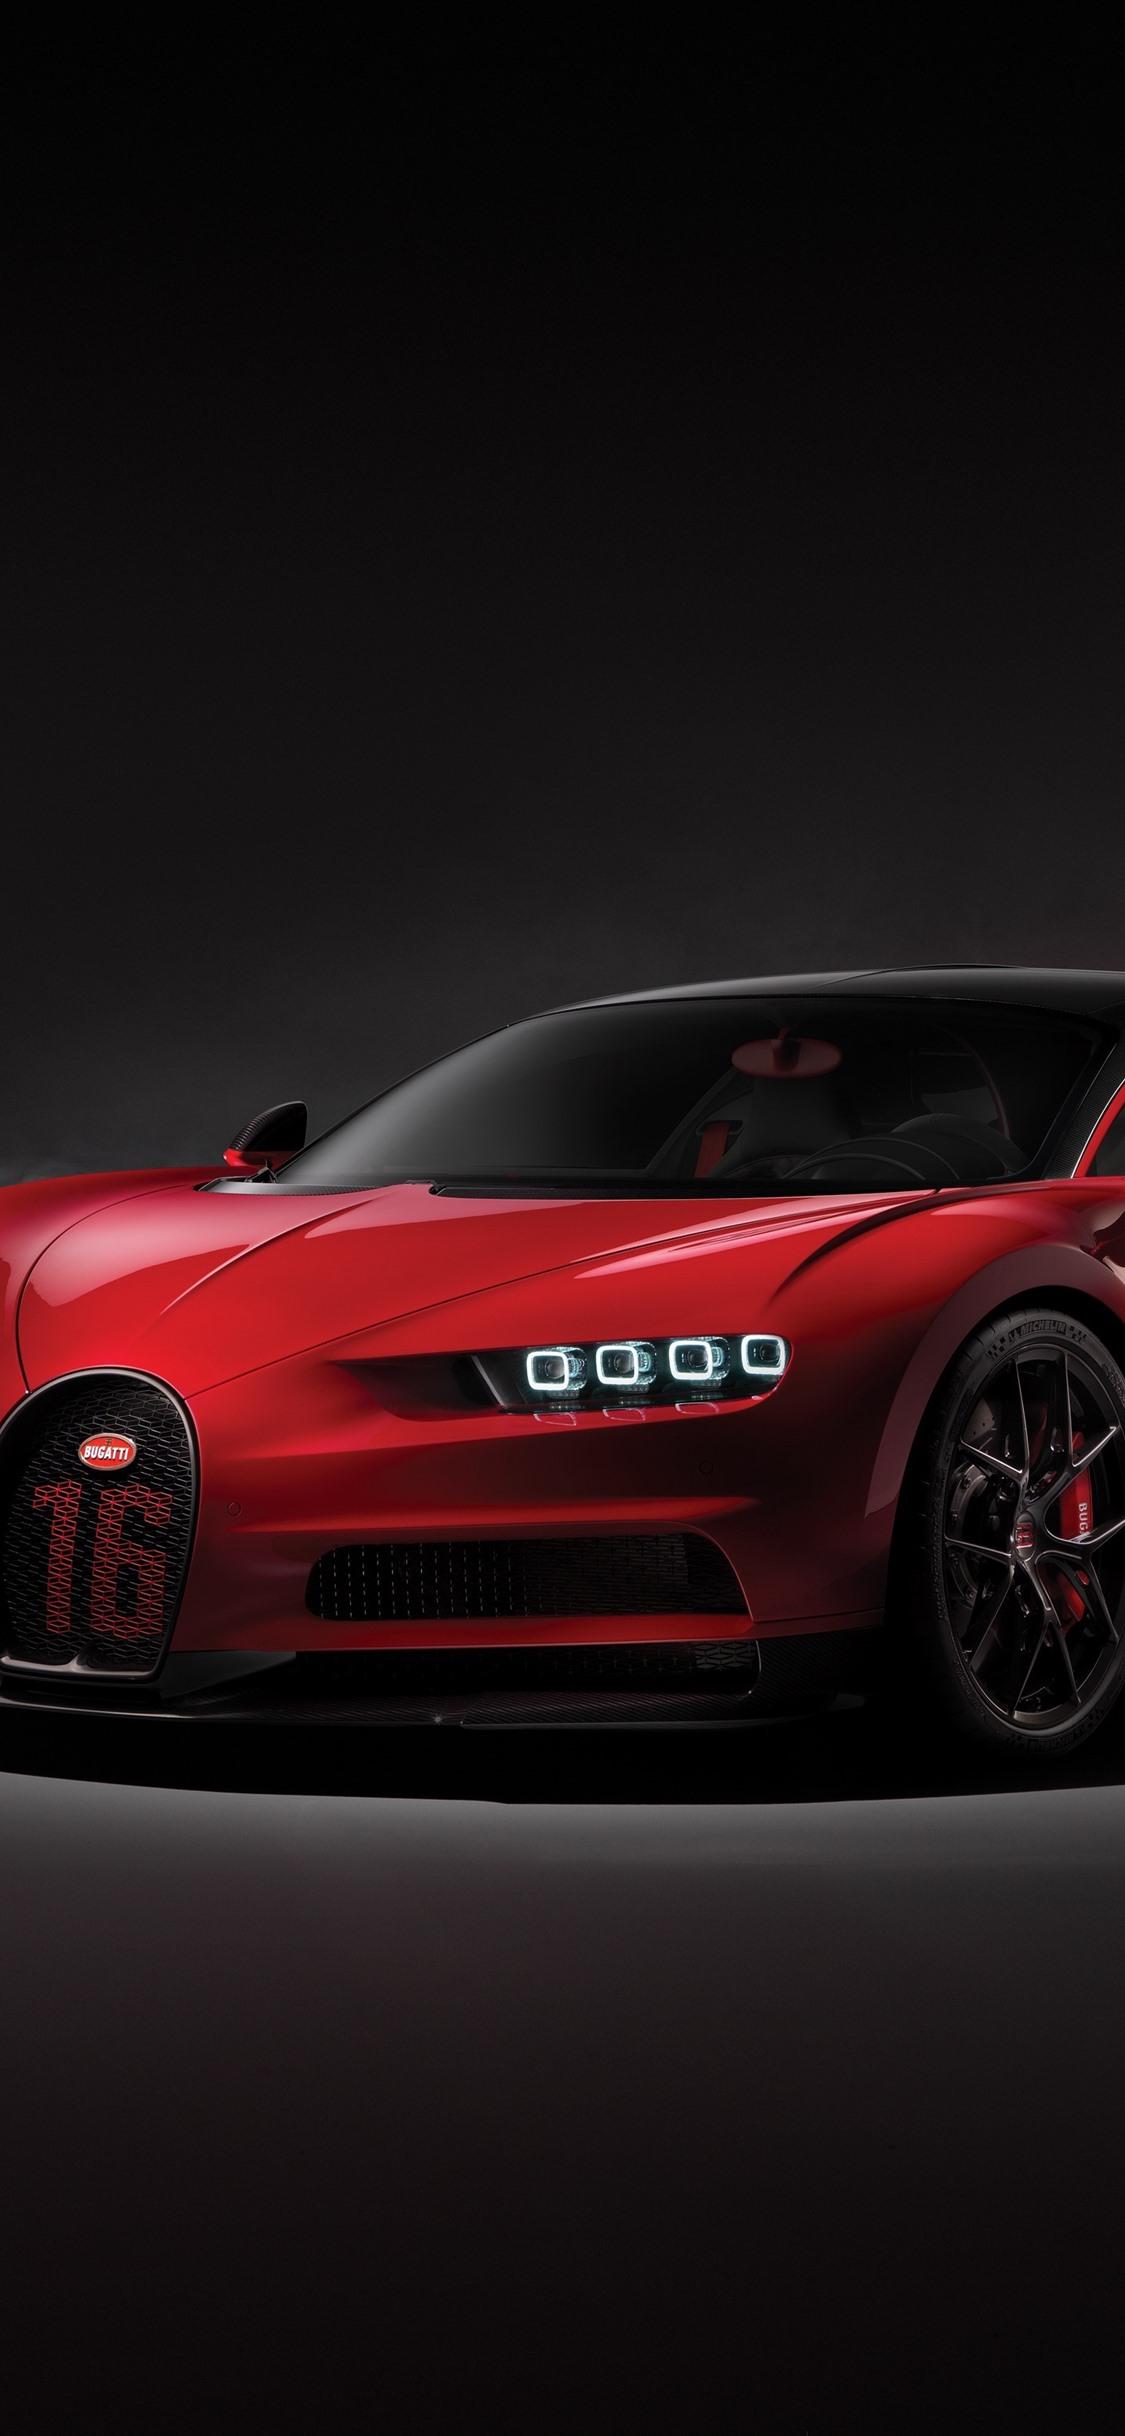 Fondos De Pantalla Vista Frontal Del Supercar Rojo Bugatti Chiron 2018 3840x2160 Uhd 4k Imagen